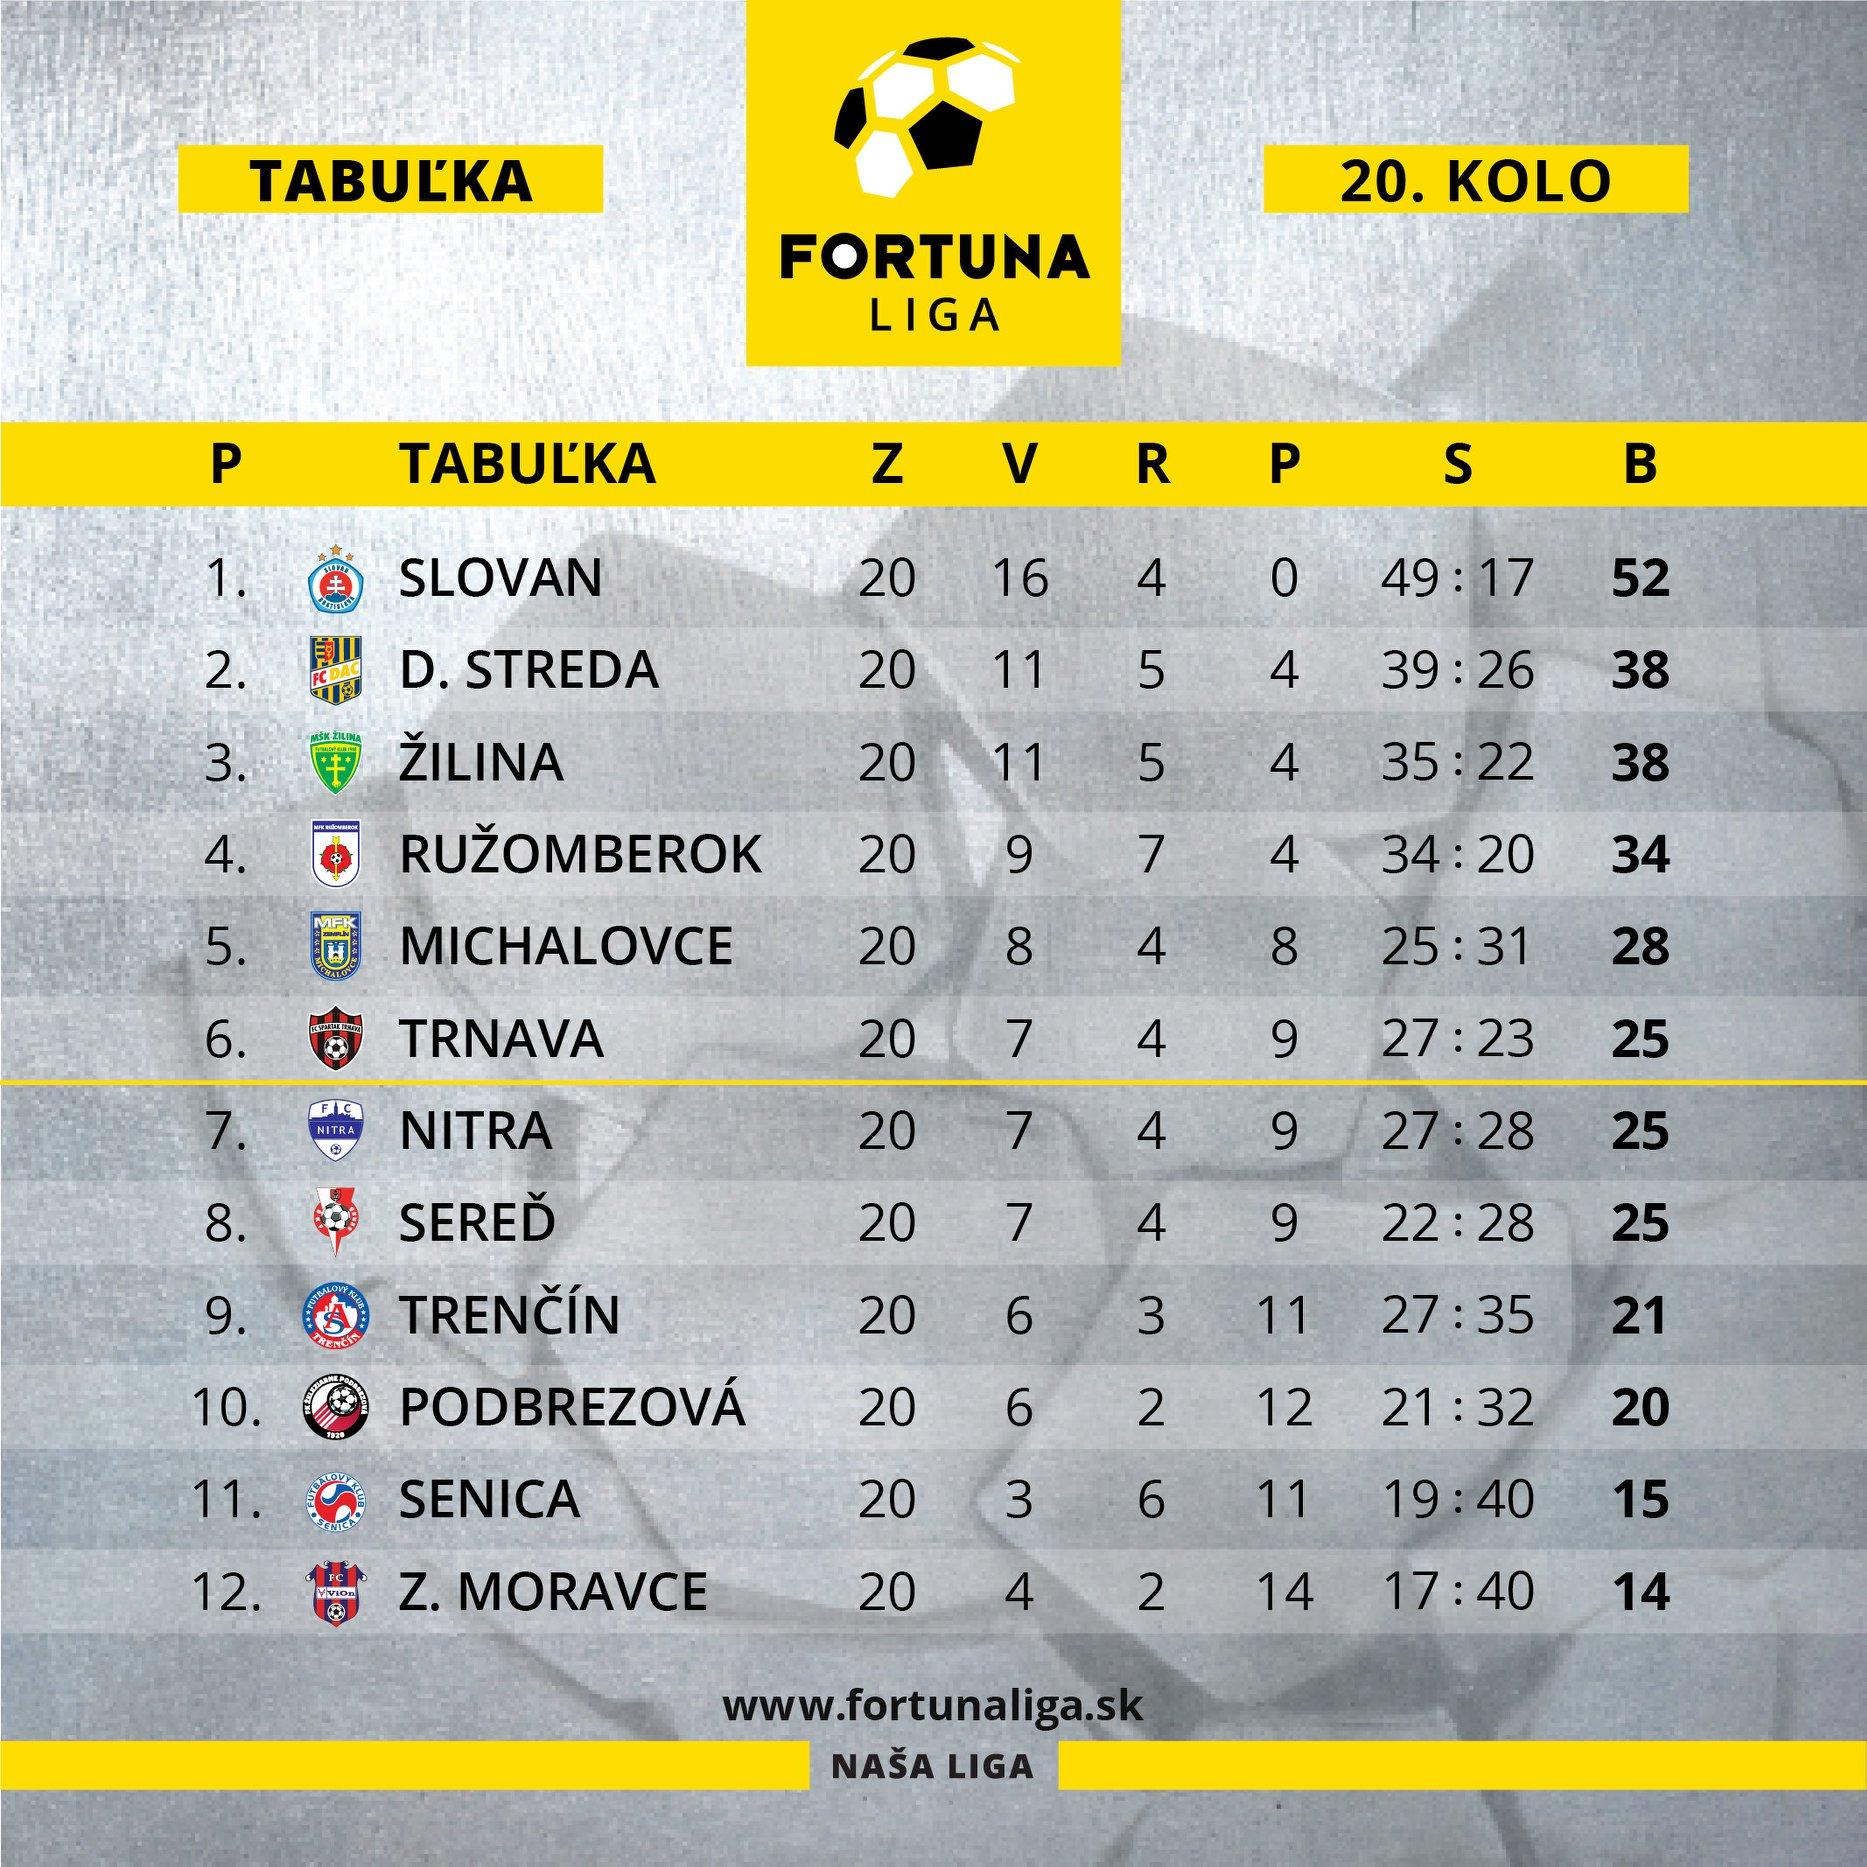 Fortuna liga table before the Derby. Source: www.fortunaliga.sk